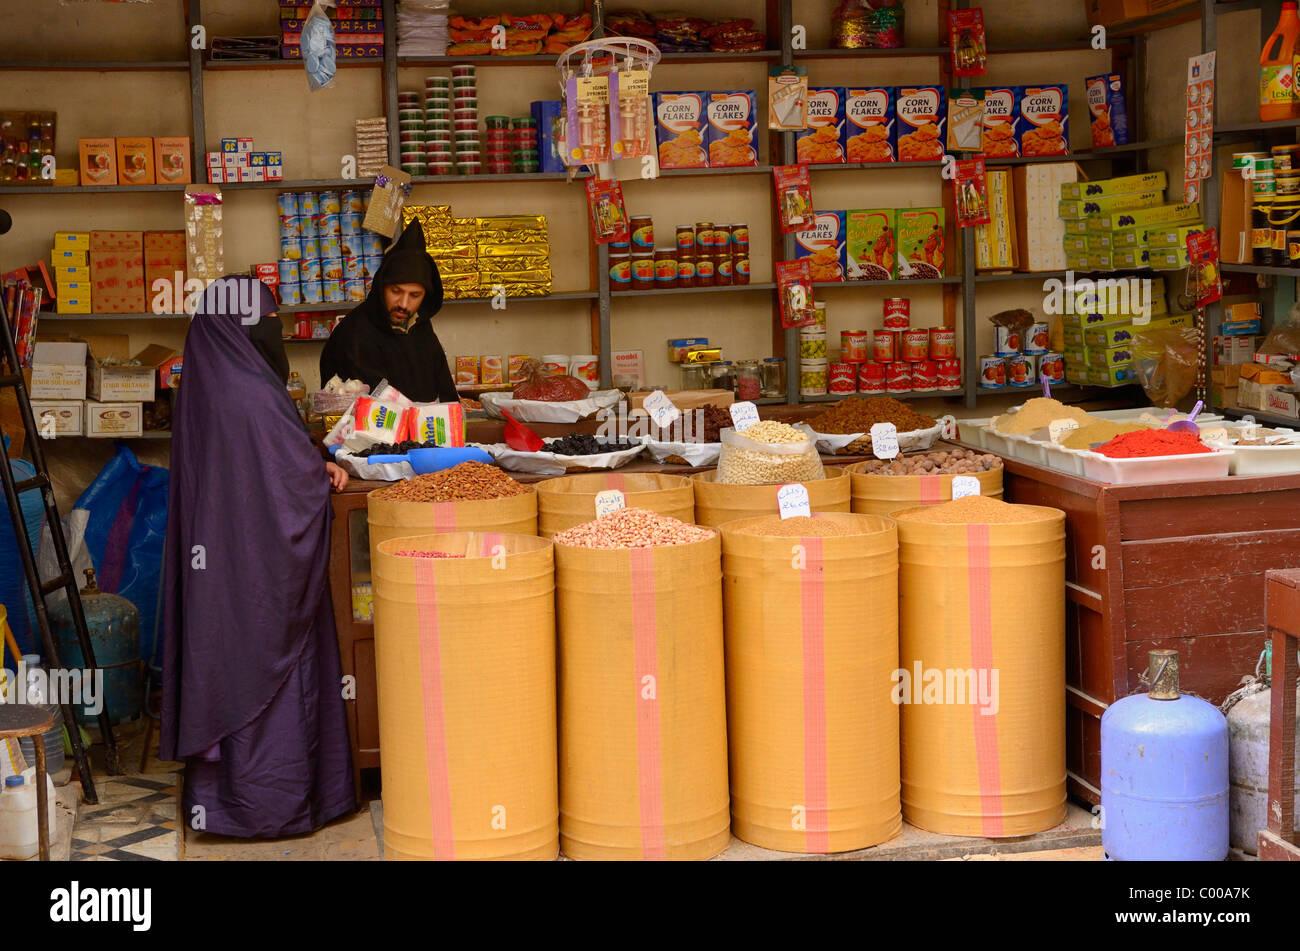 grocery store worker in djellaba female customer in purple grocery store worker in djellaba female customer in purple hijab in fes el bali medina fez north africa